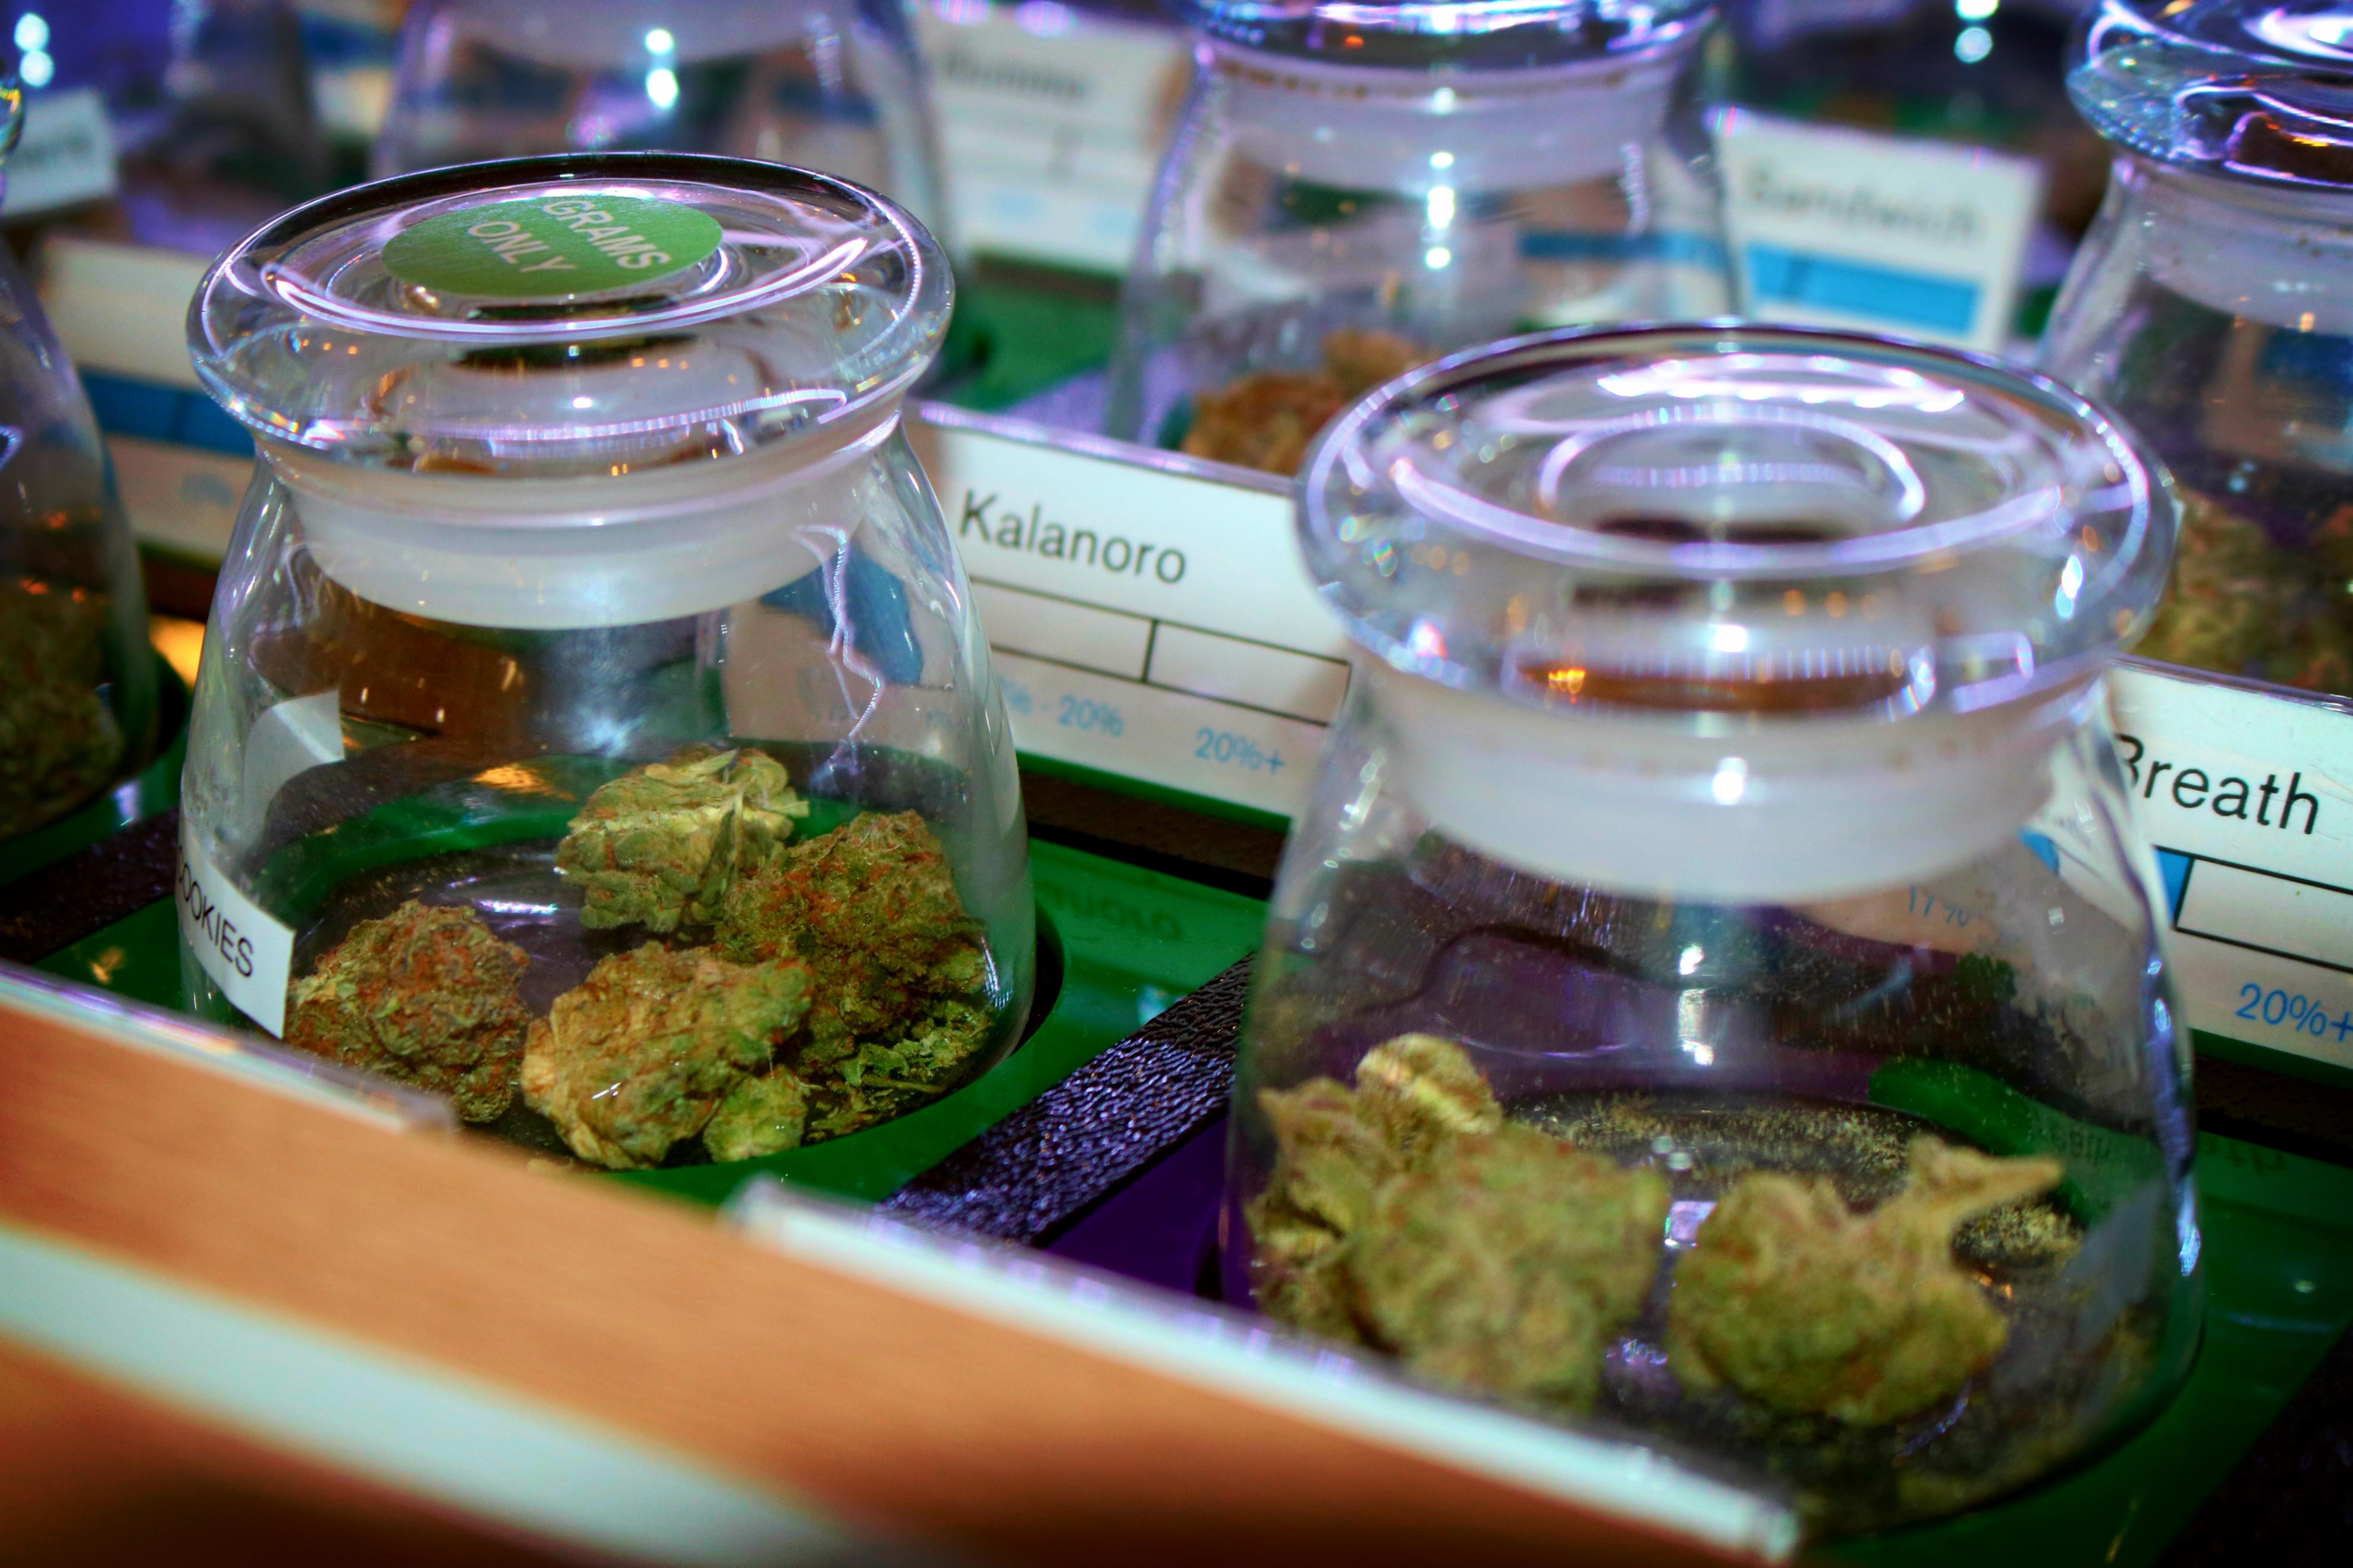 medical marijuana buds in glass jars